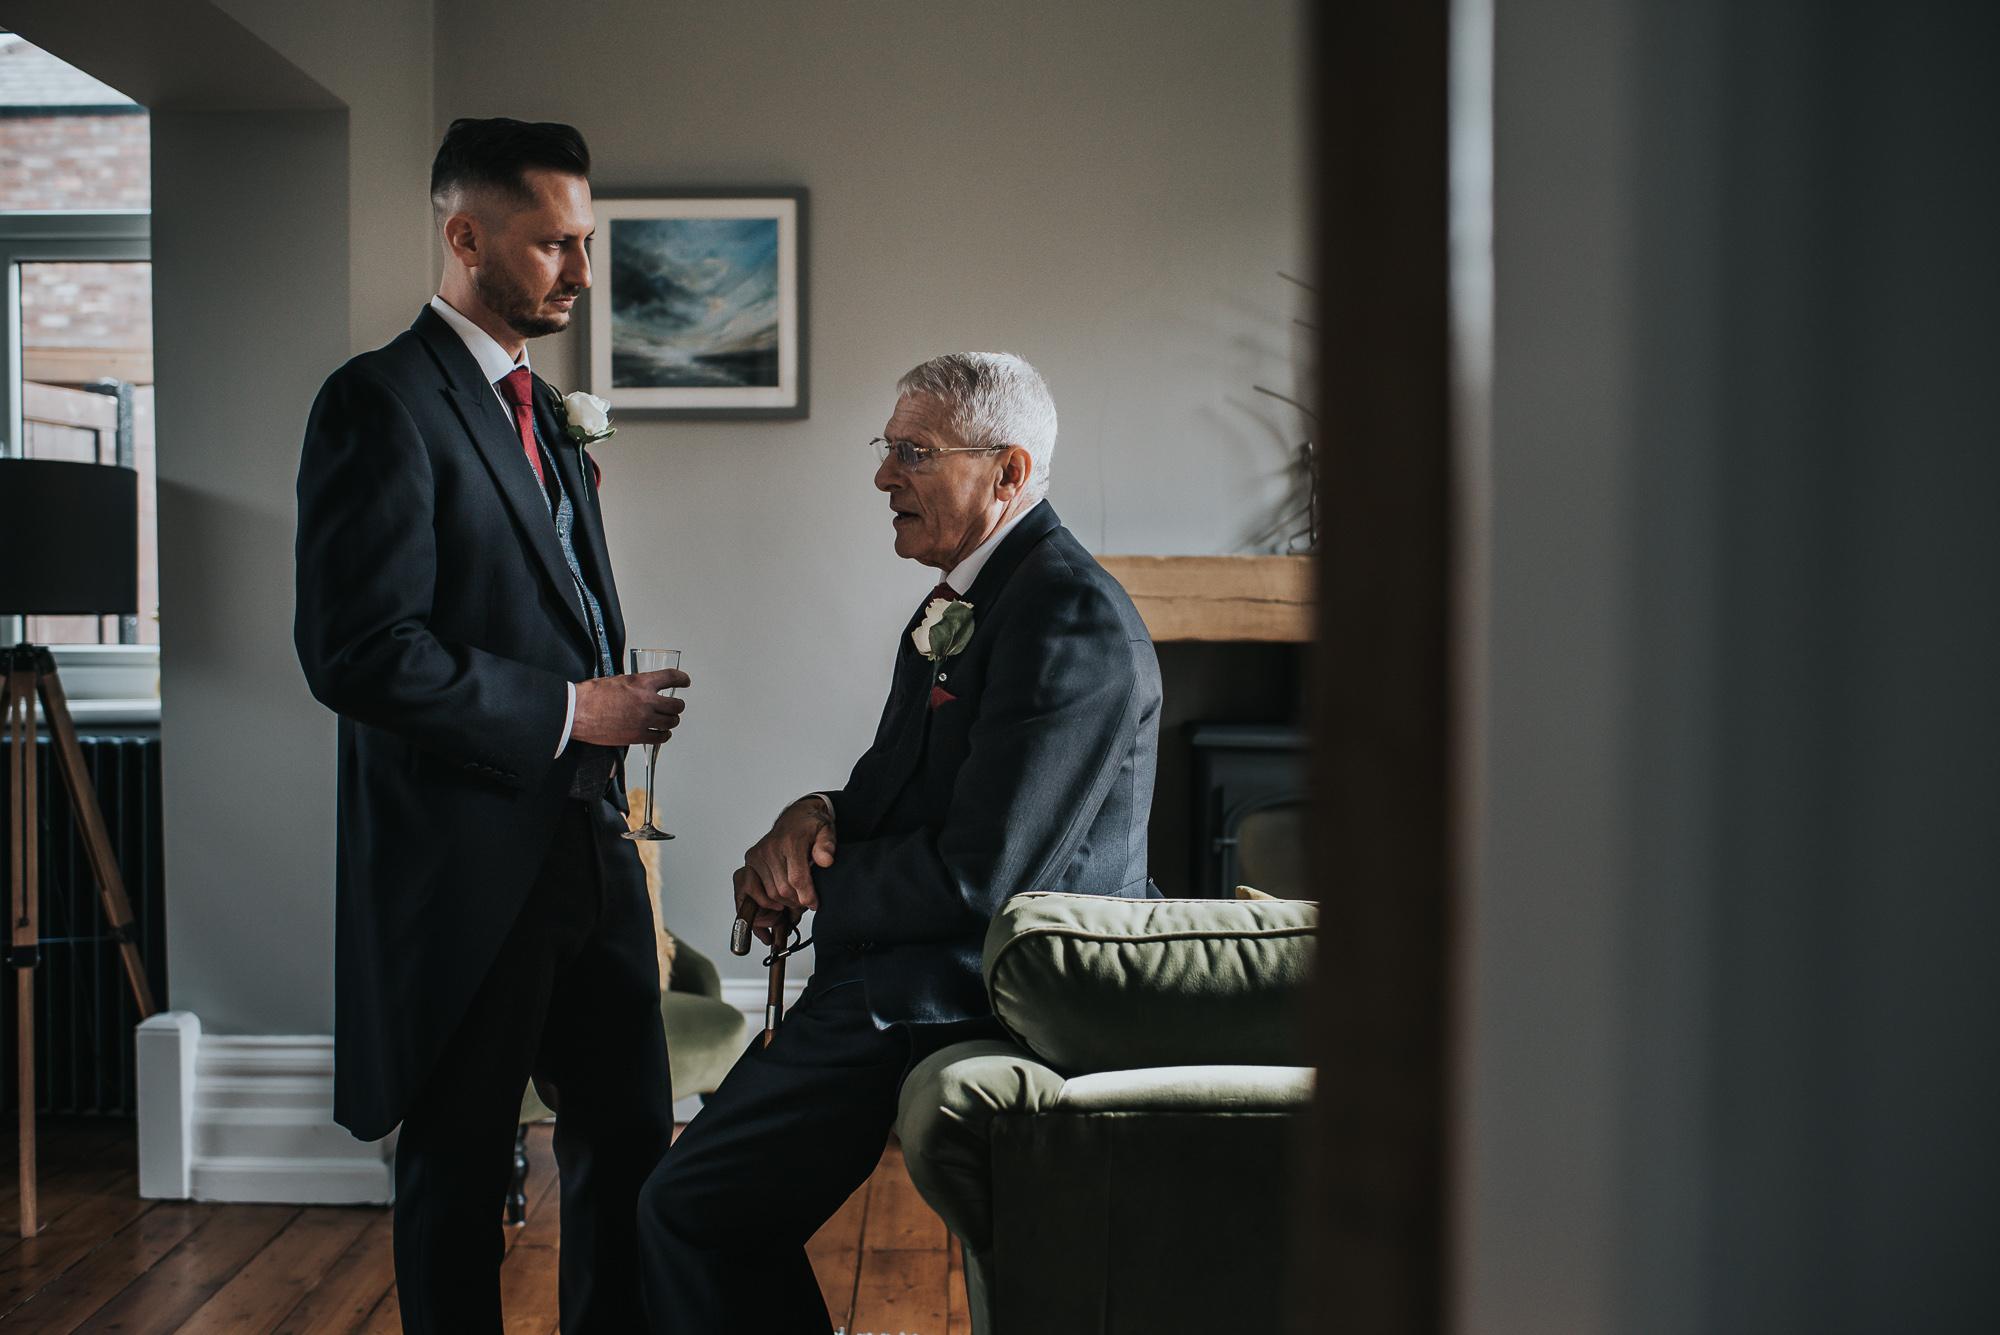 Hayloft cheshire wedding same sex gay wedding  (10 of 35).jpg